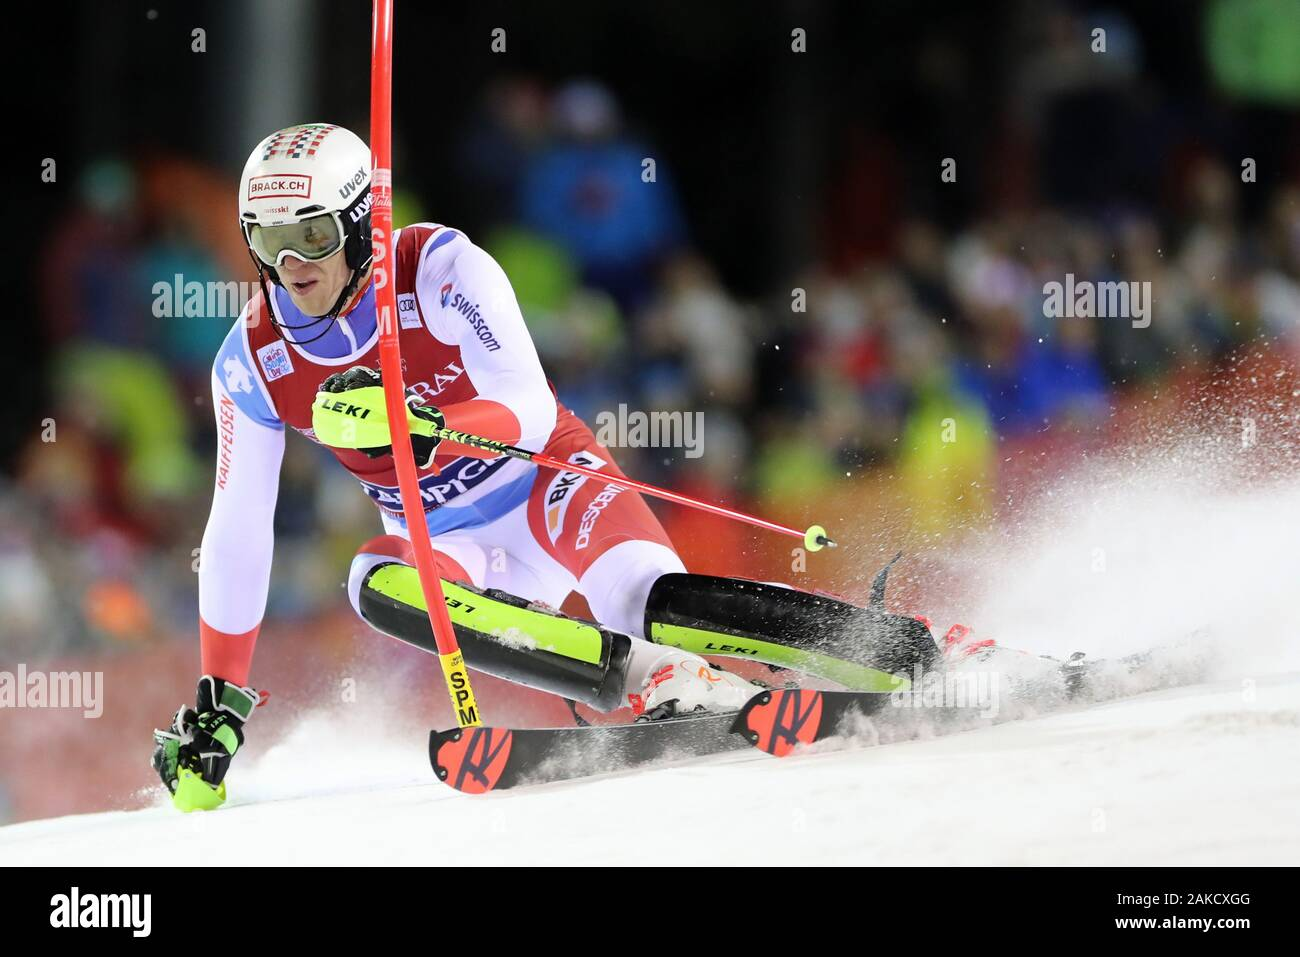 Madonna di Campiglio, Italy. 8th Jan 2020. FIS Alpine Ski World Cup Men's Night Slalom in Madonna di Campiglio, Italy on January 8, 2020, Ramon Zenhaeusern (SUI) - Editorial Use Credit: Action Plus Sports Images/Alamy Live News Stock Photo